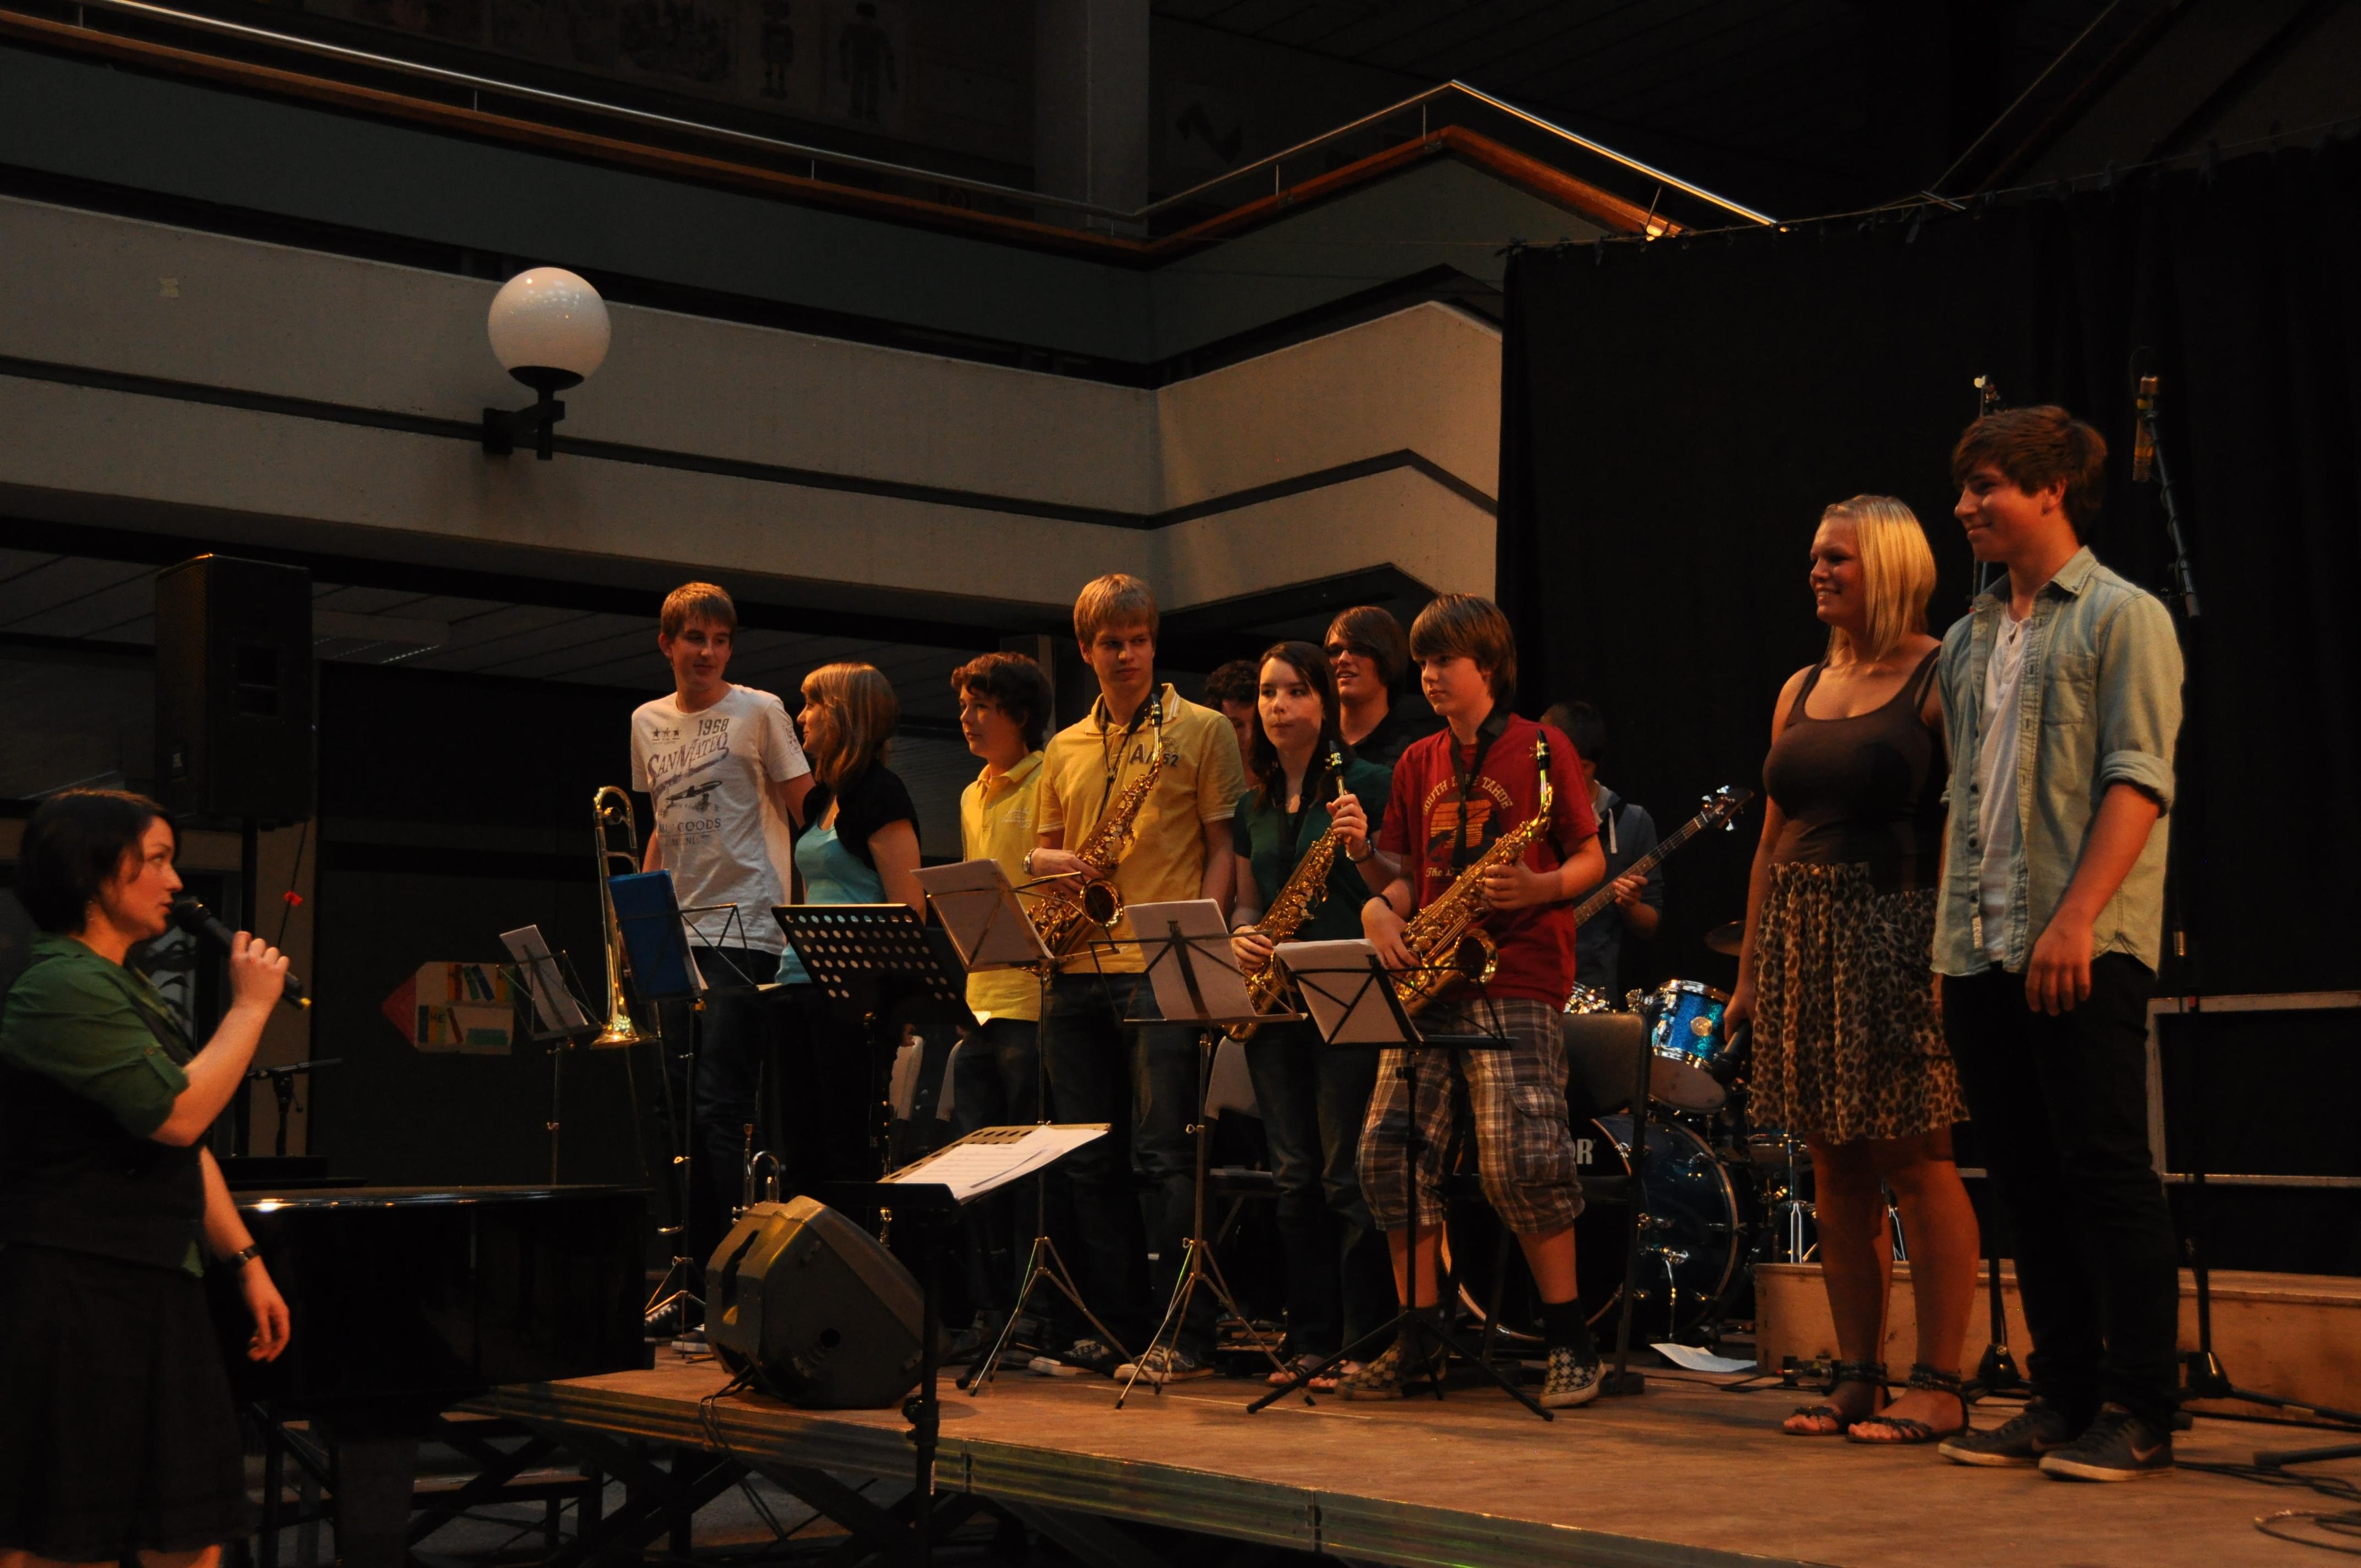 08.06.2011_Querbeat (56)